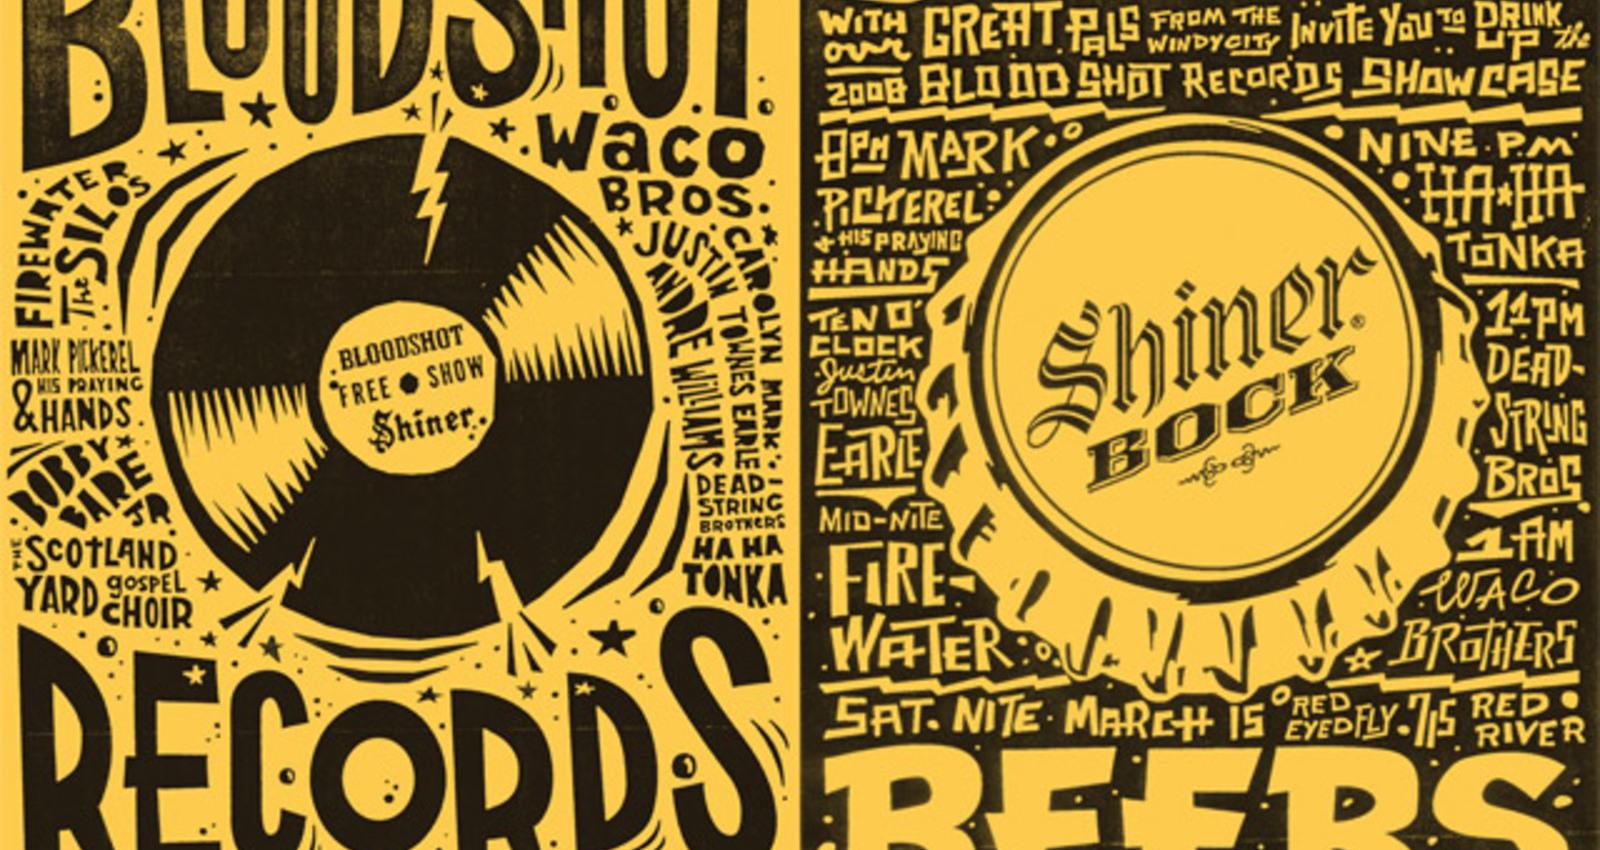 SXSW Bloodshot Records Poster